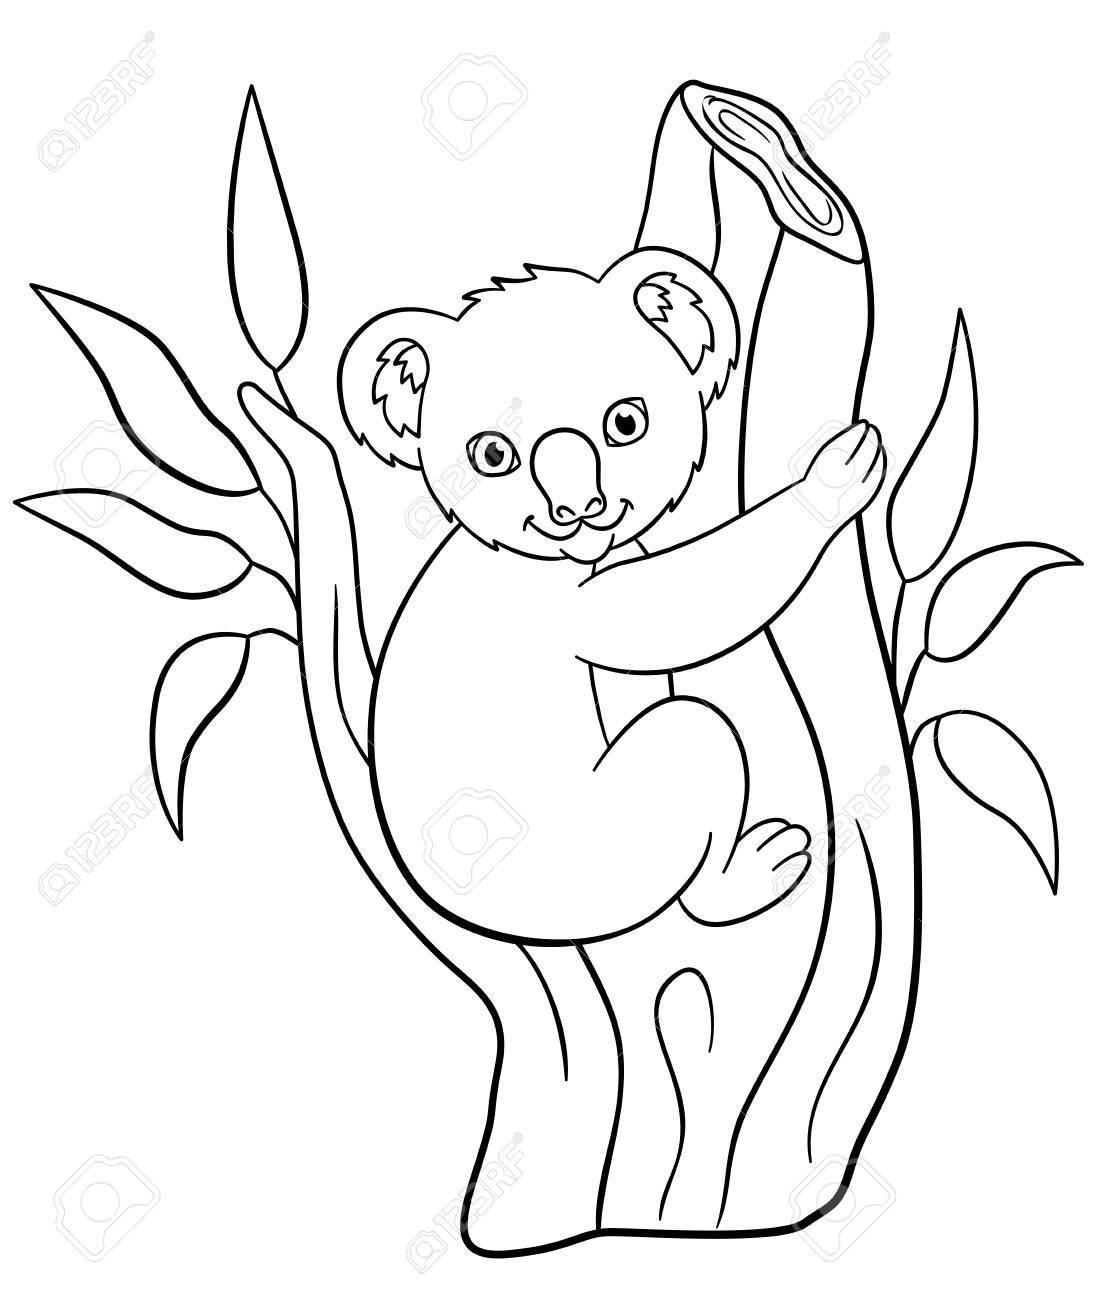 Atemberaubend Koala Malvorlagen Ideen - Entry Level Resume Vorlagen ...